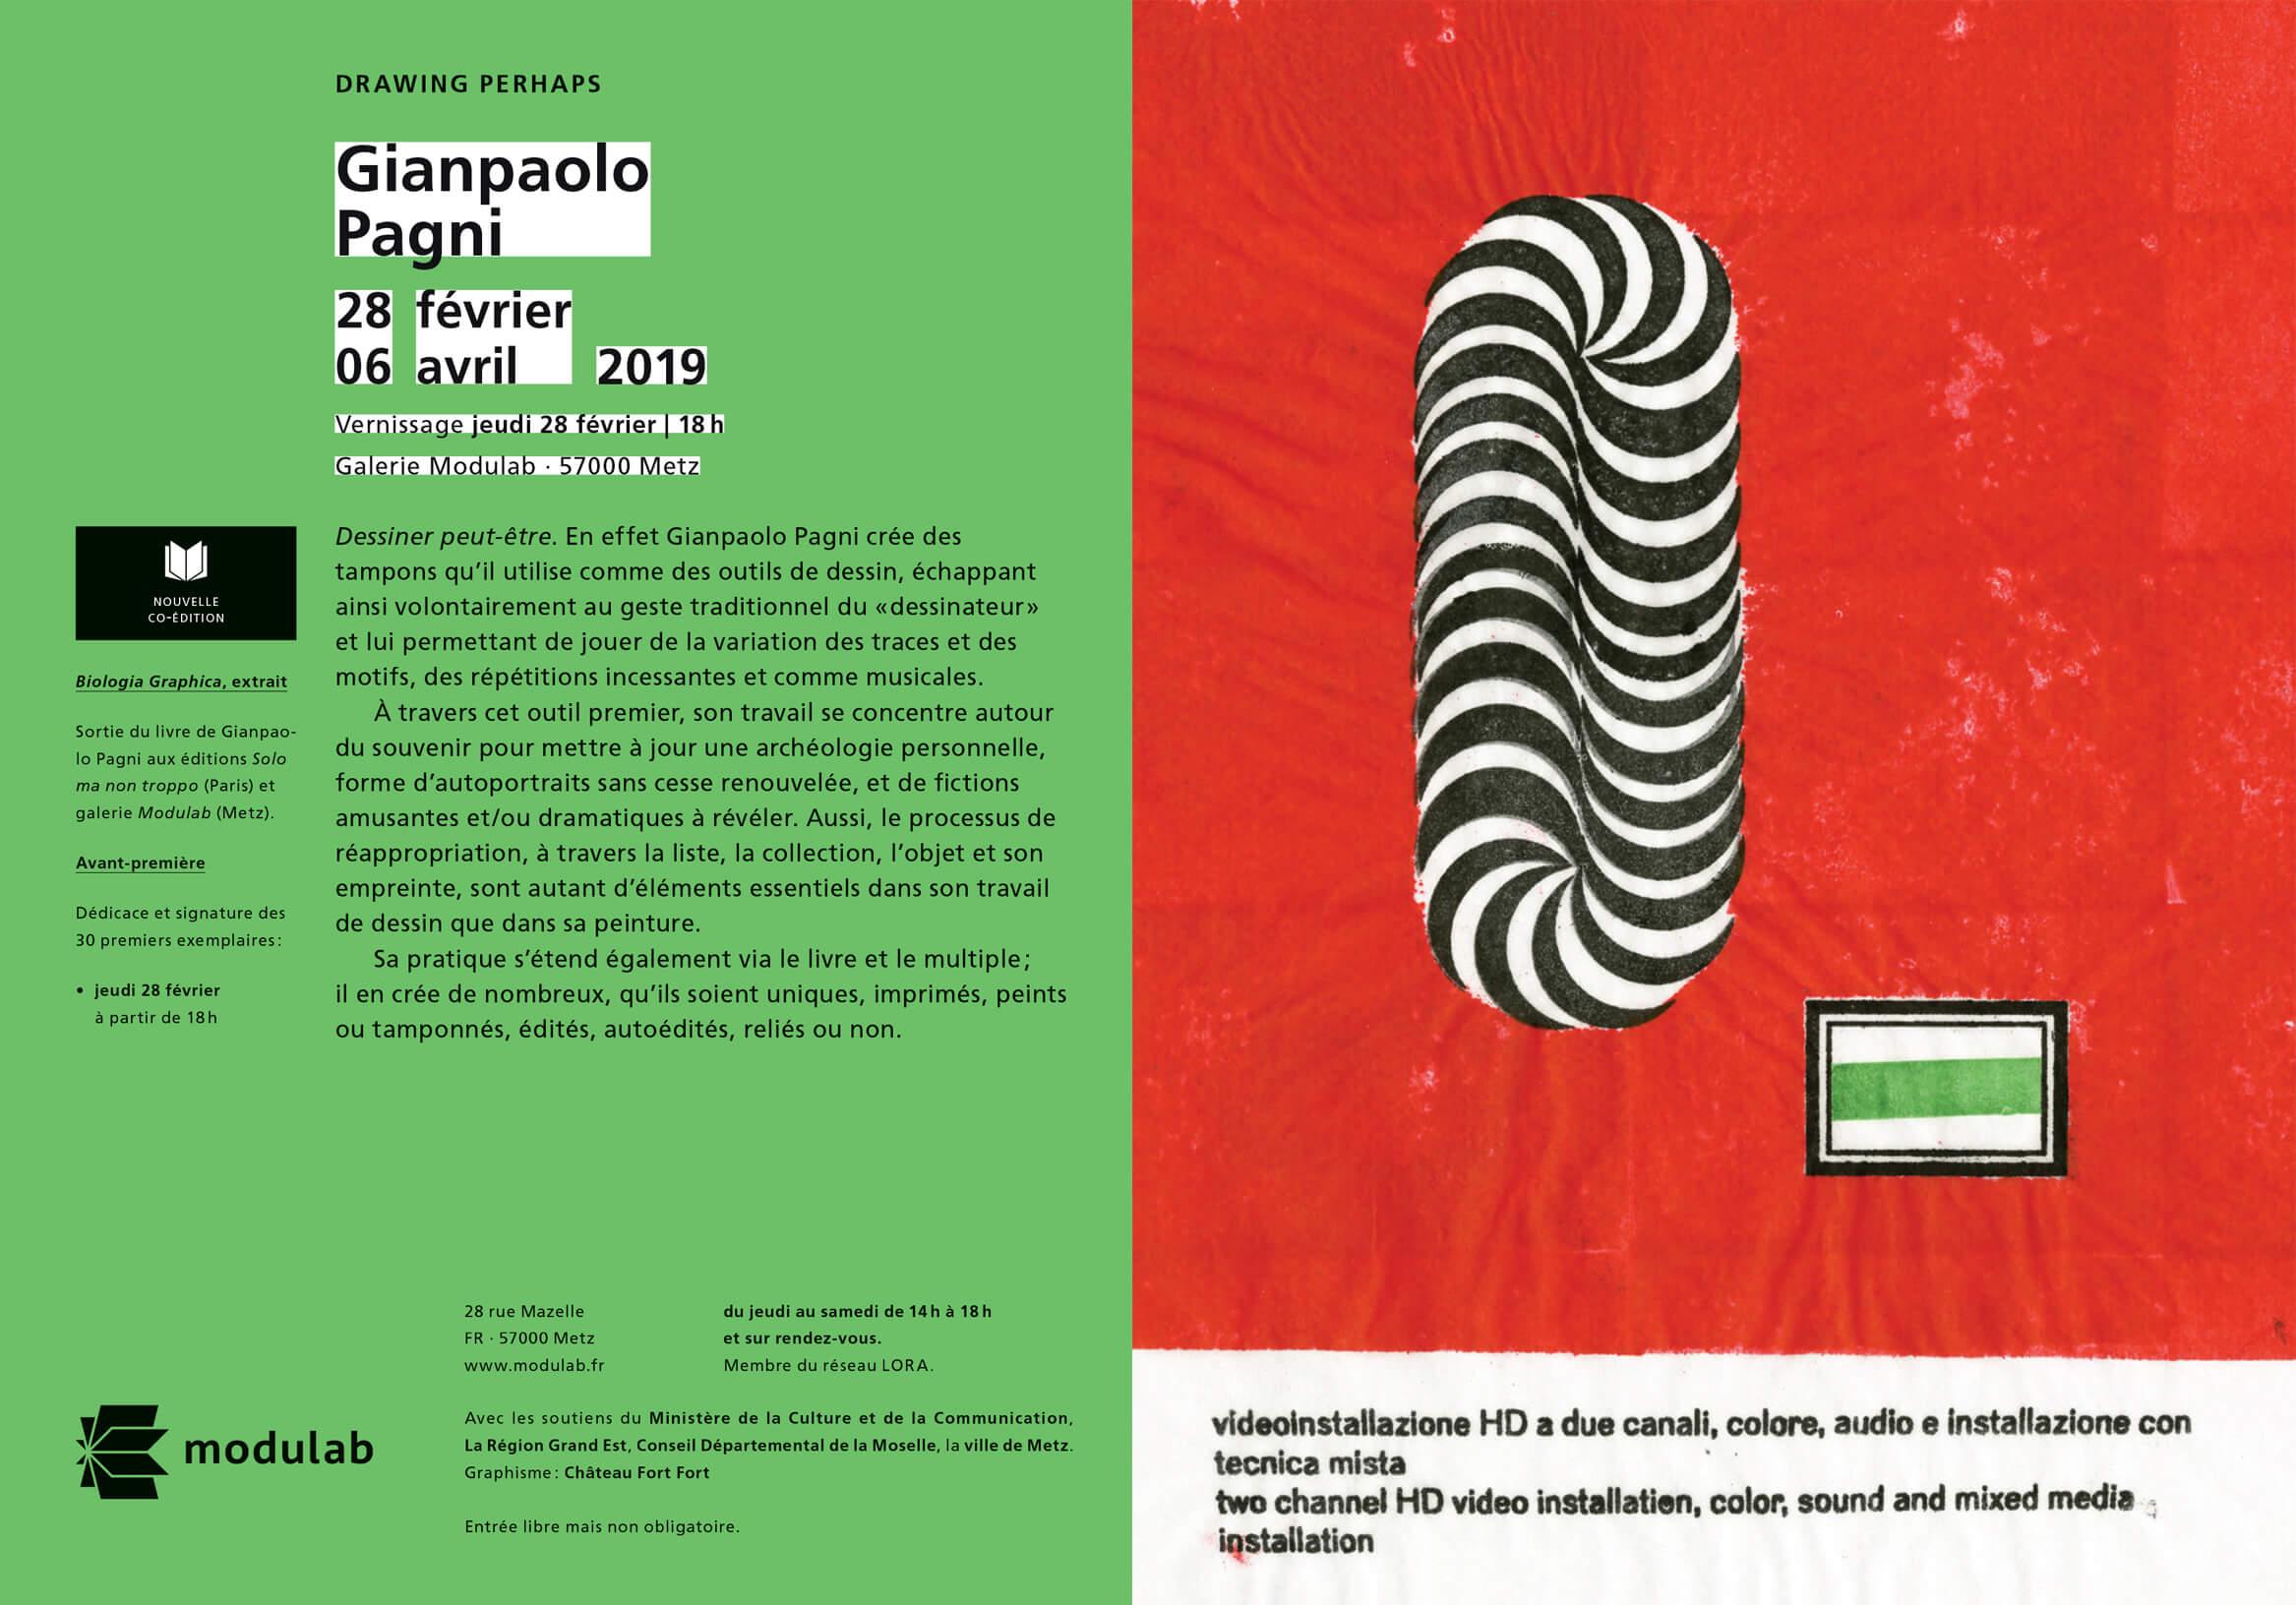 Flyer Modulab - Gianpaolo Pagni - Drawing Perhaps